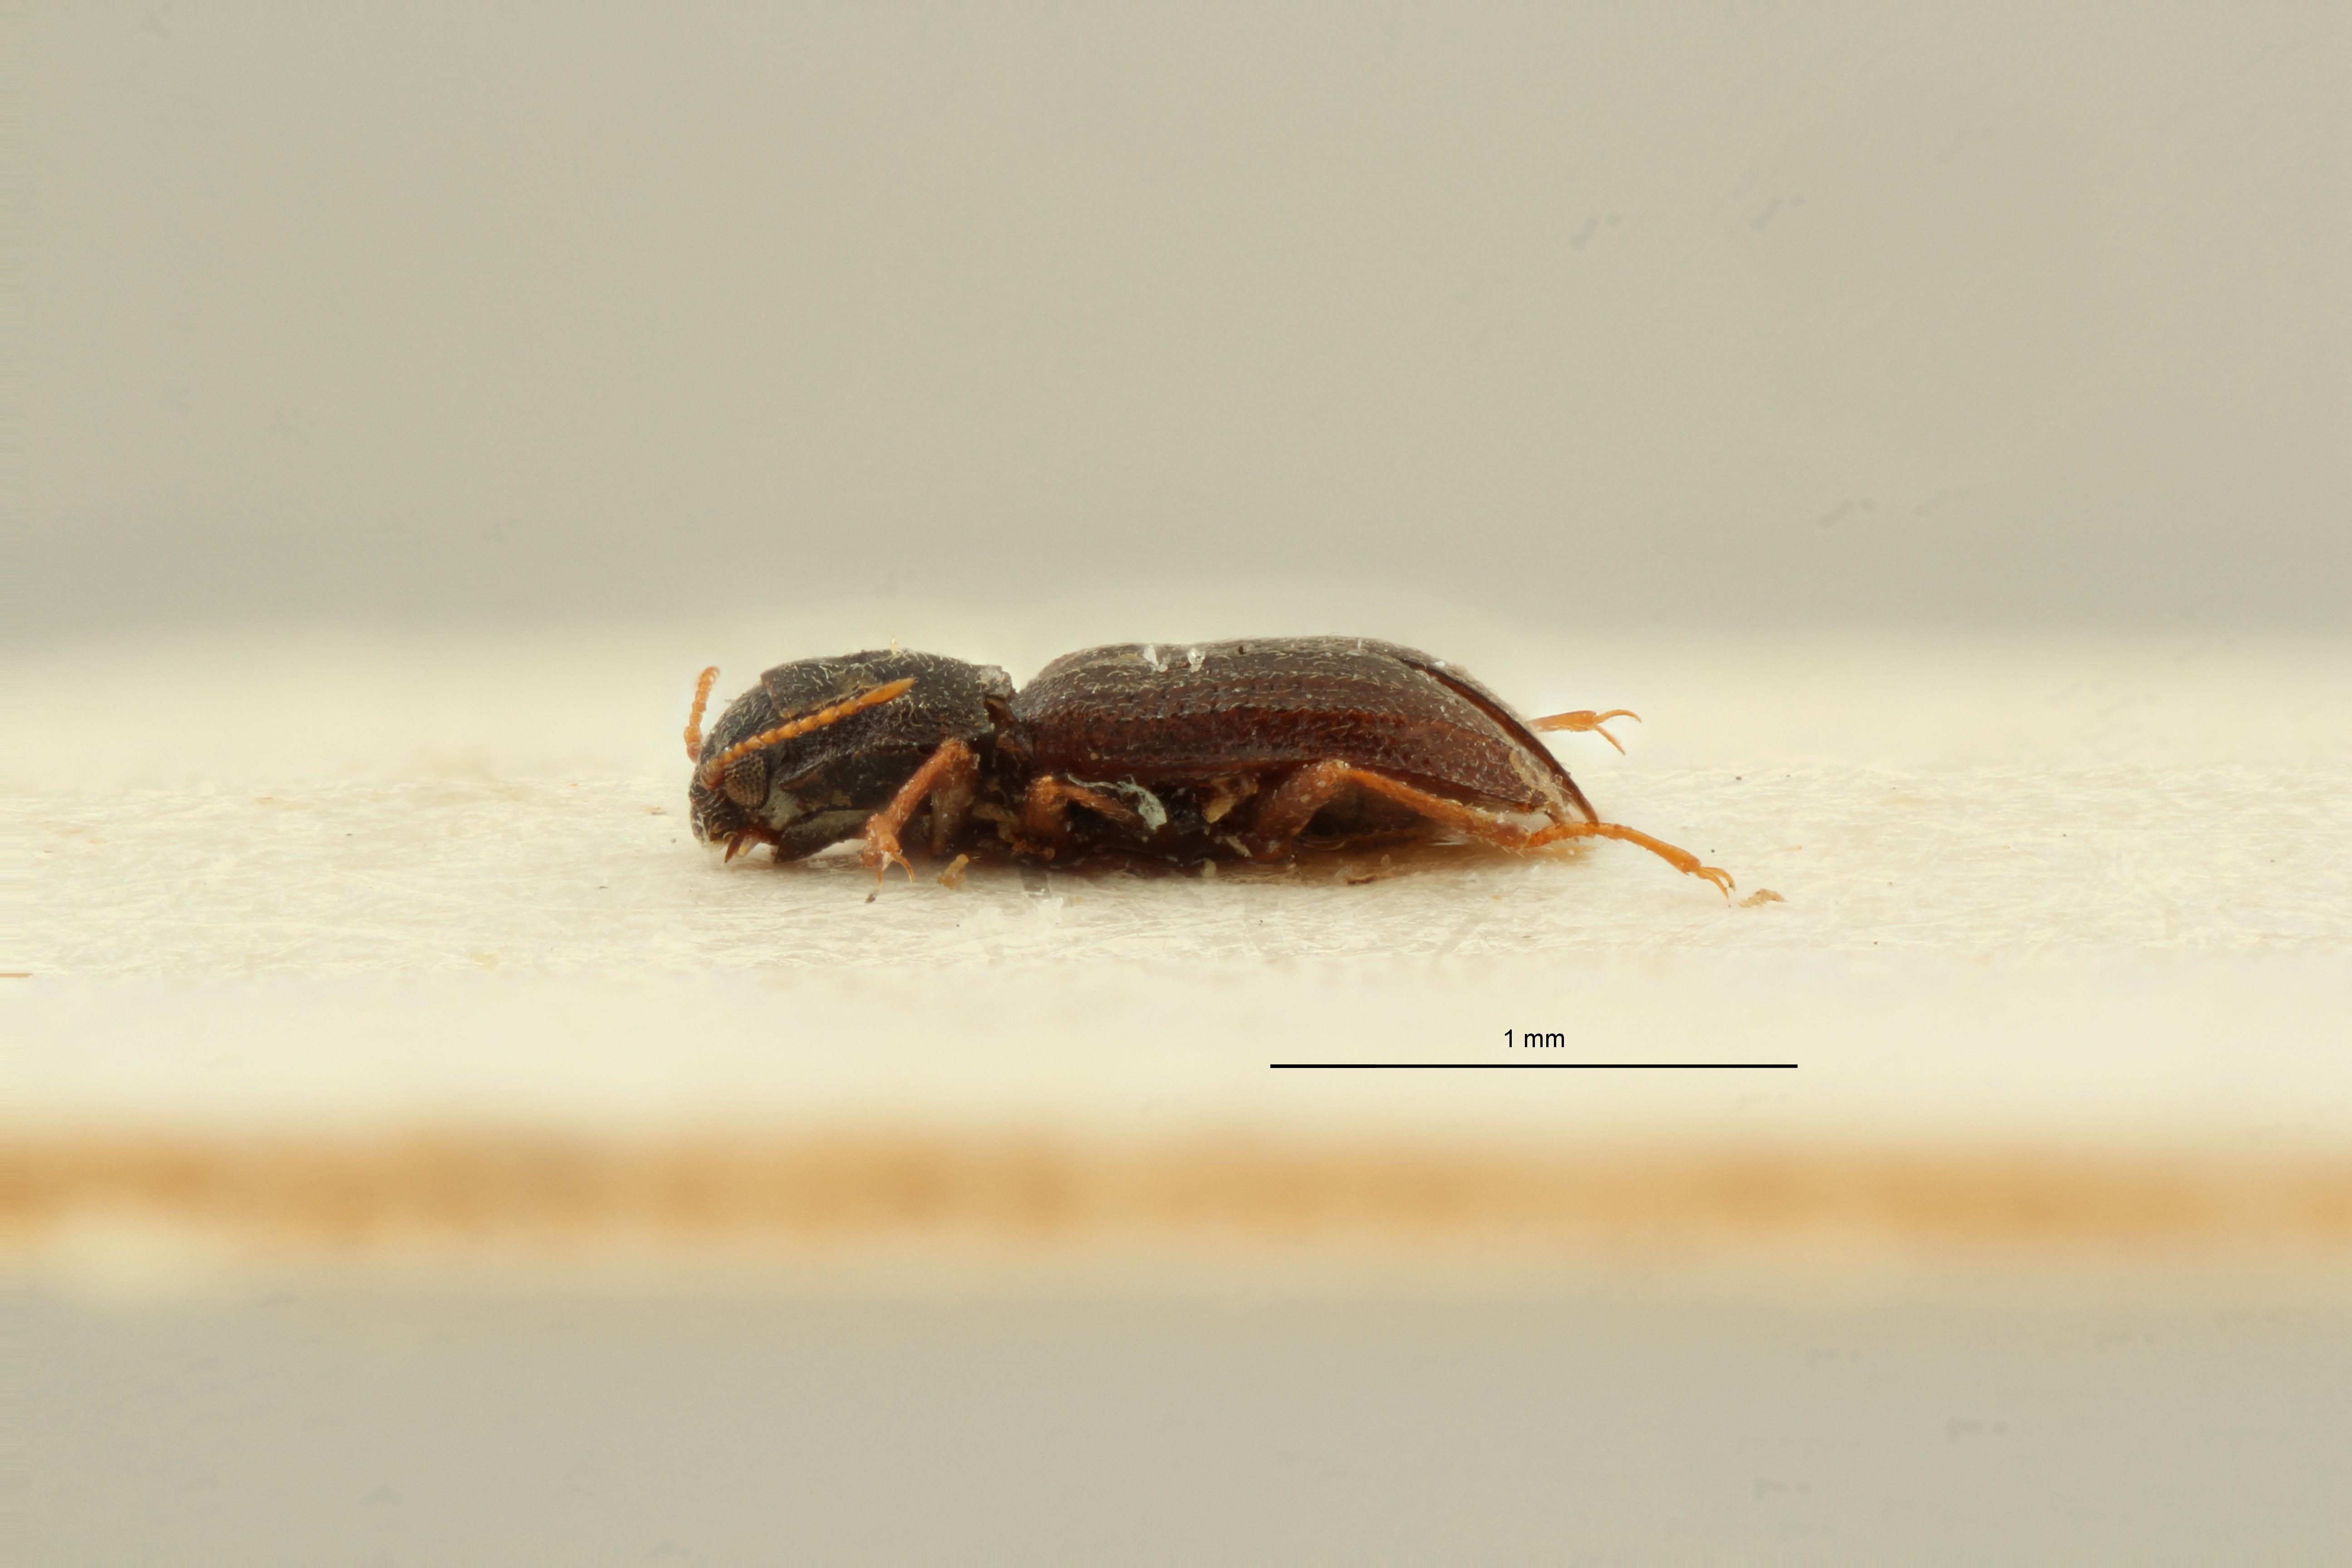 Microcylloepus chilensis pt L ZS PMax Scaled.jpeg